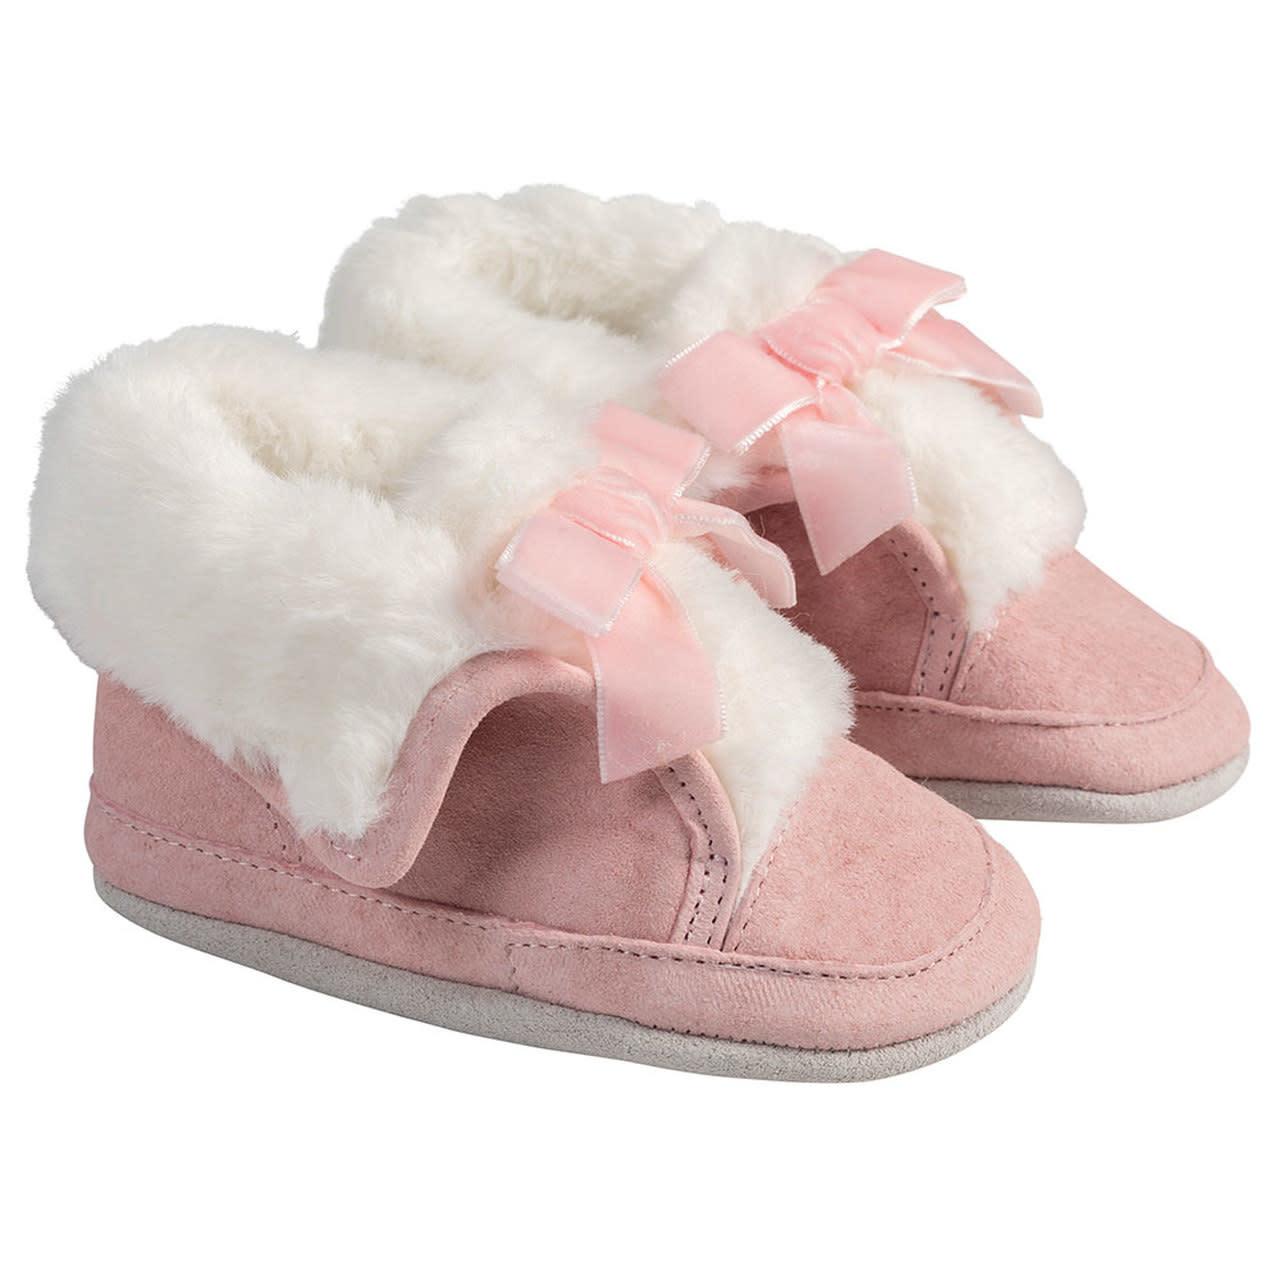 Robeez Willa Boot - Pink